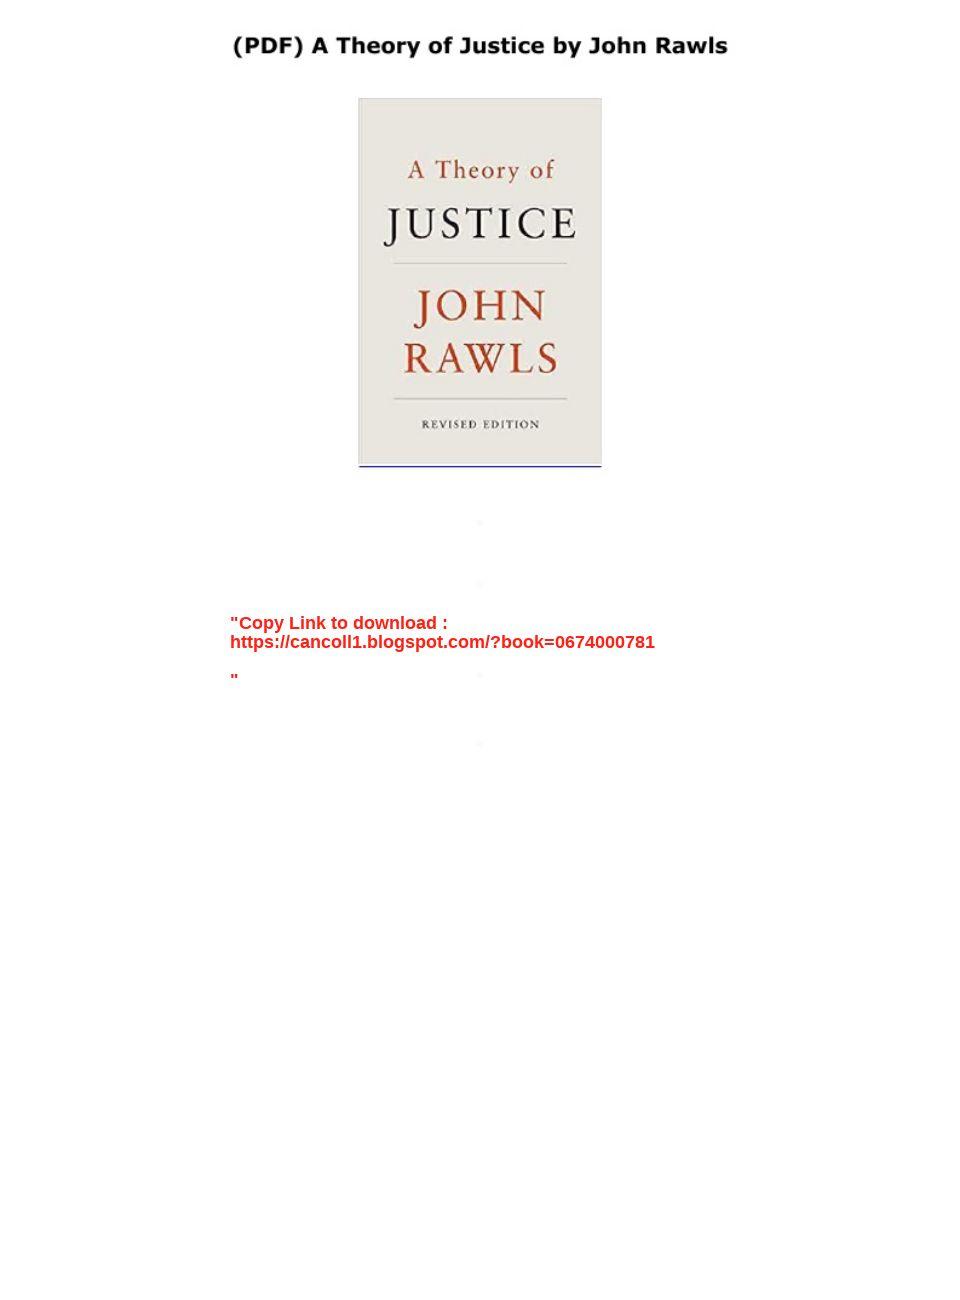 John Rawls Theory Of Justice Pdf